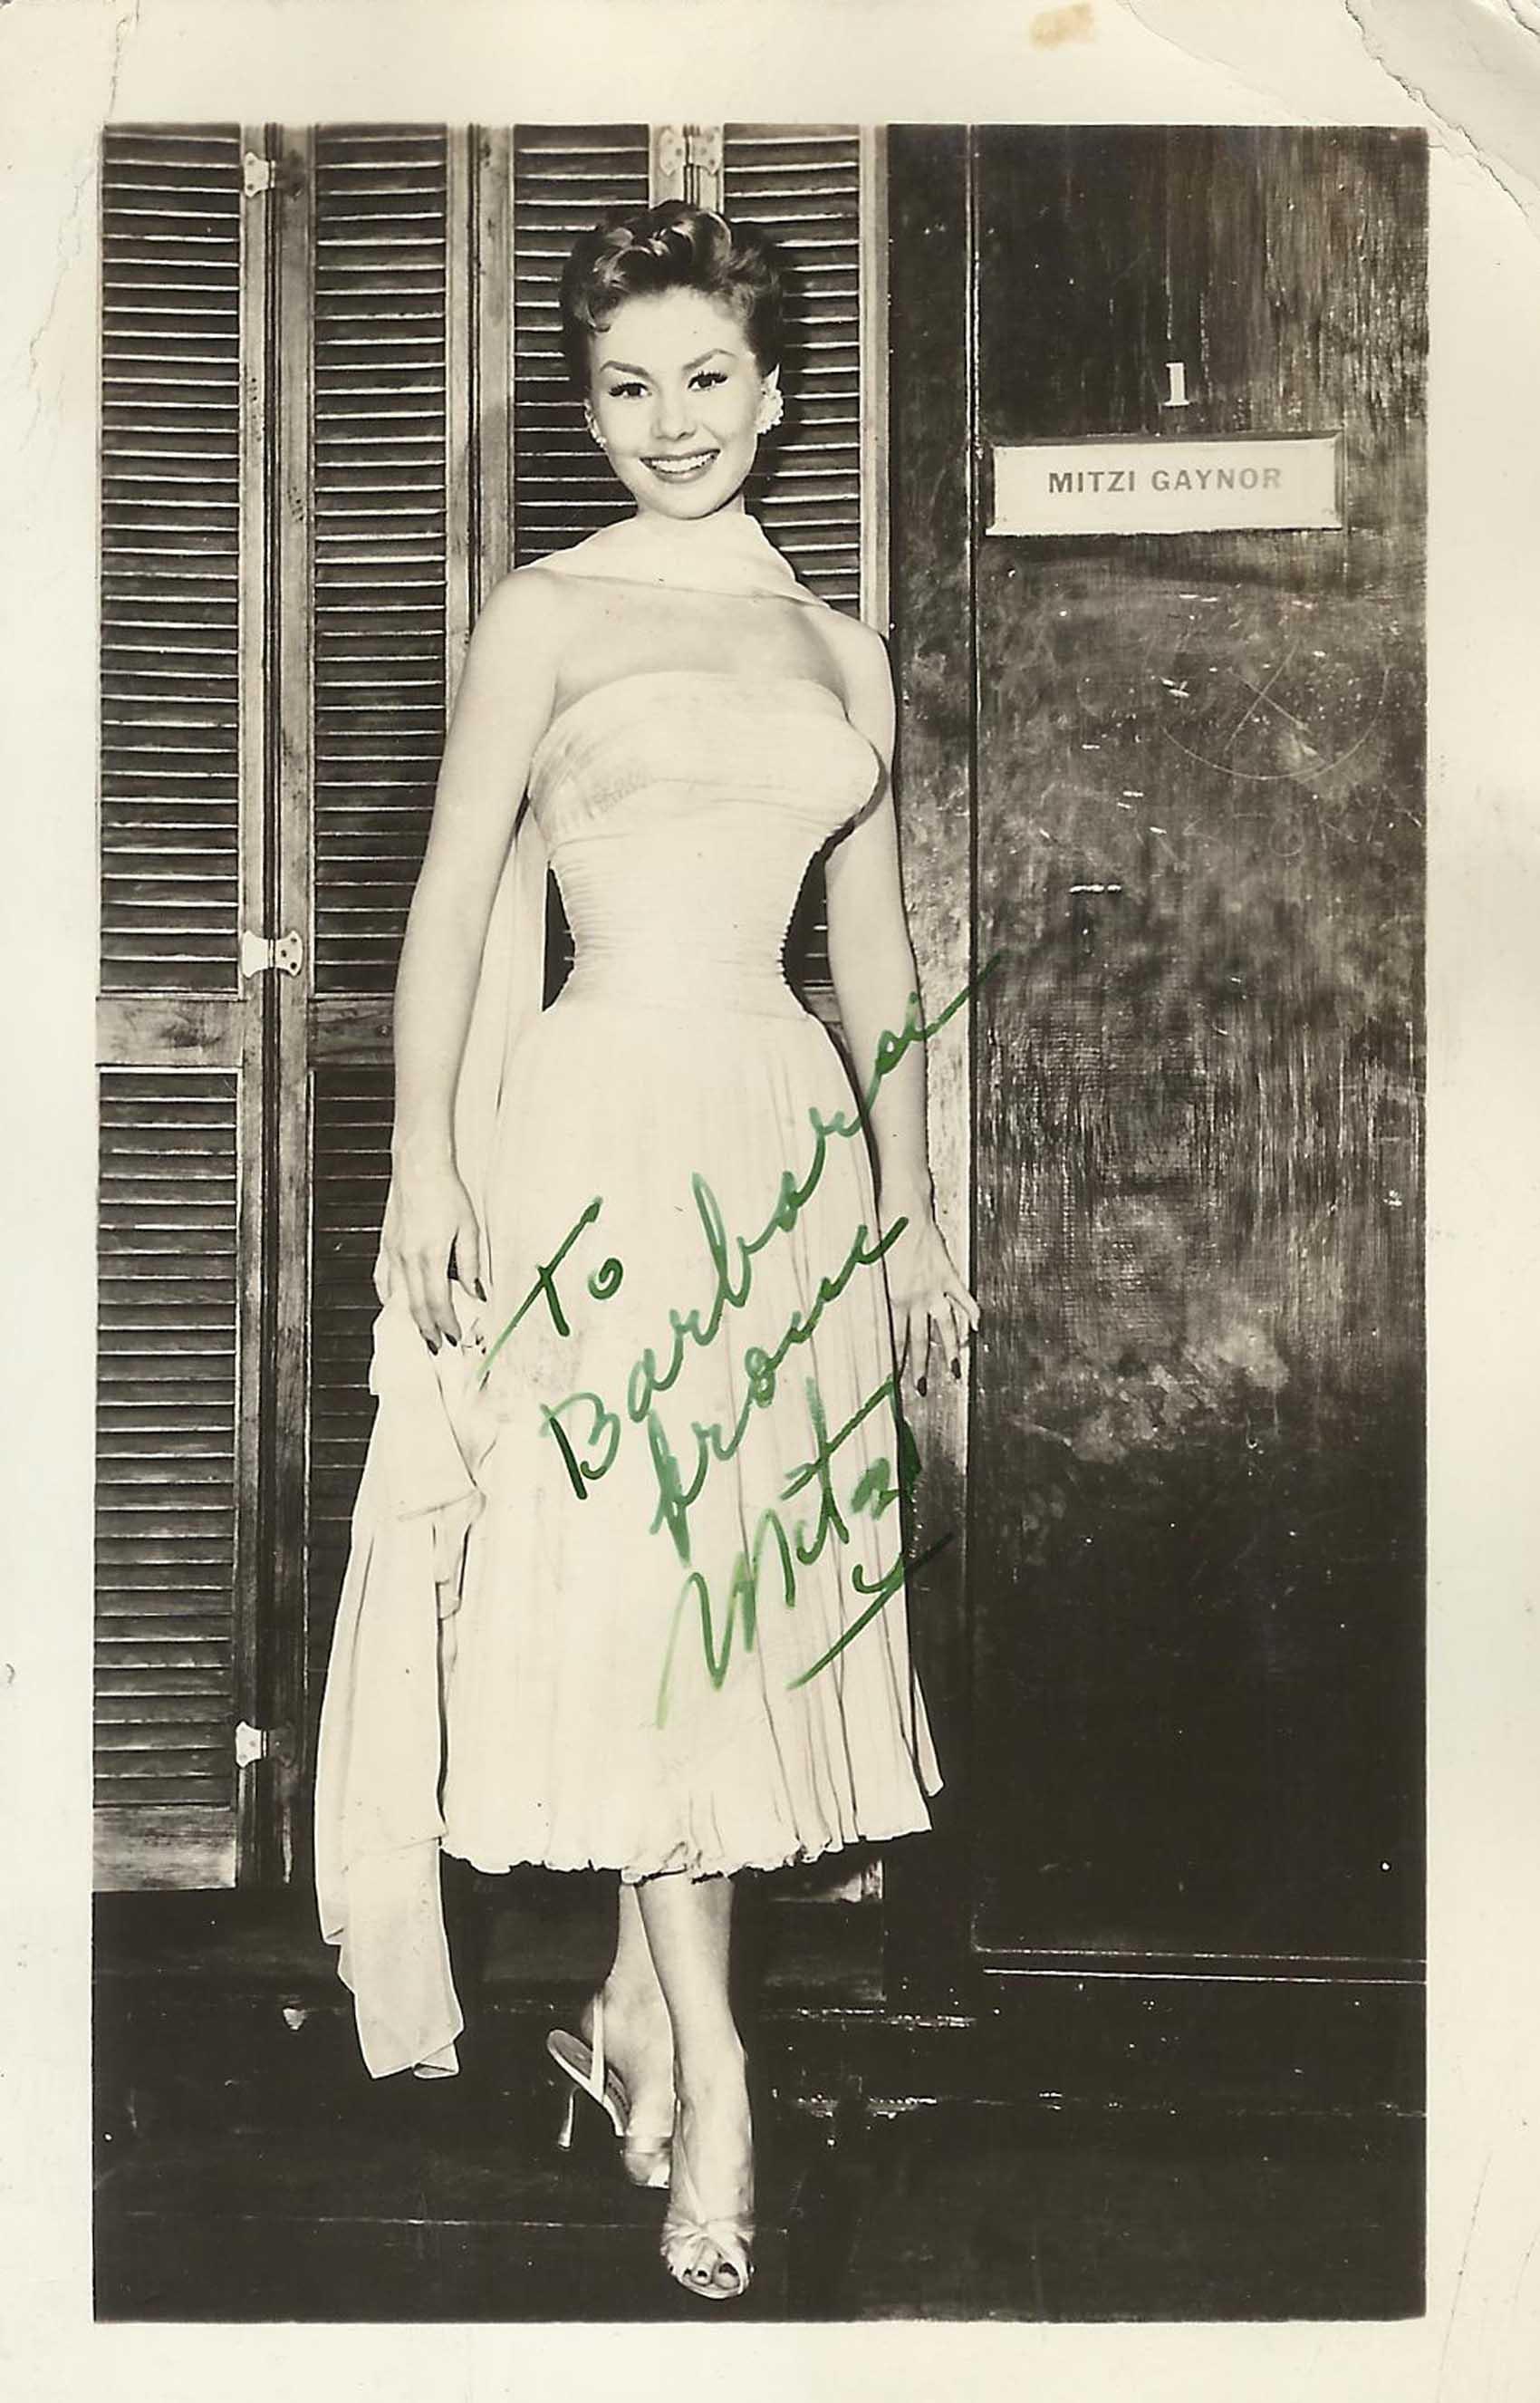 Mitzi Gaynor imagenes Biografia fotos desnuda pics